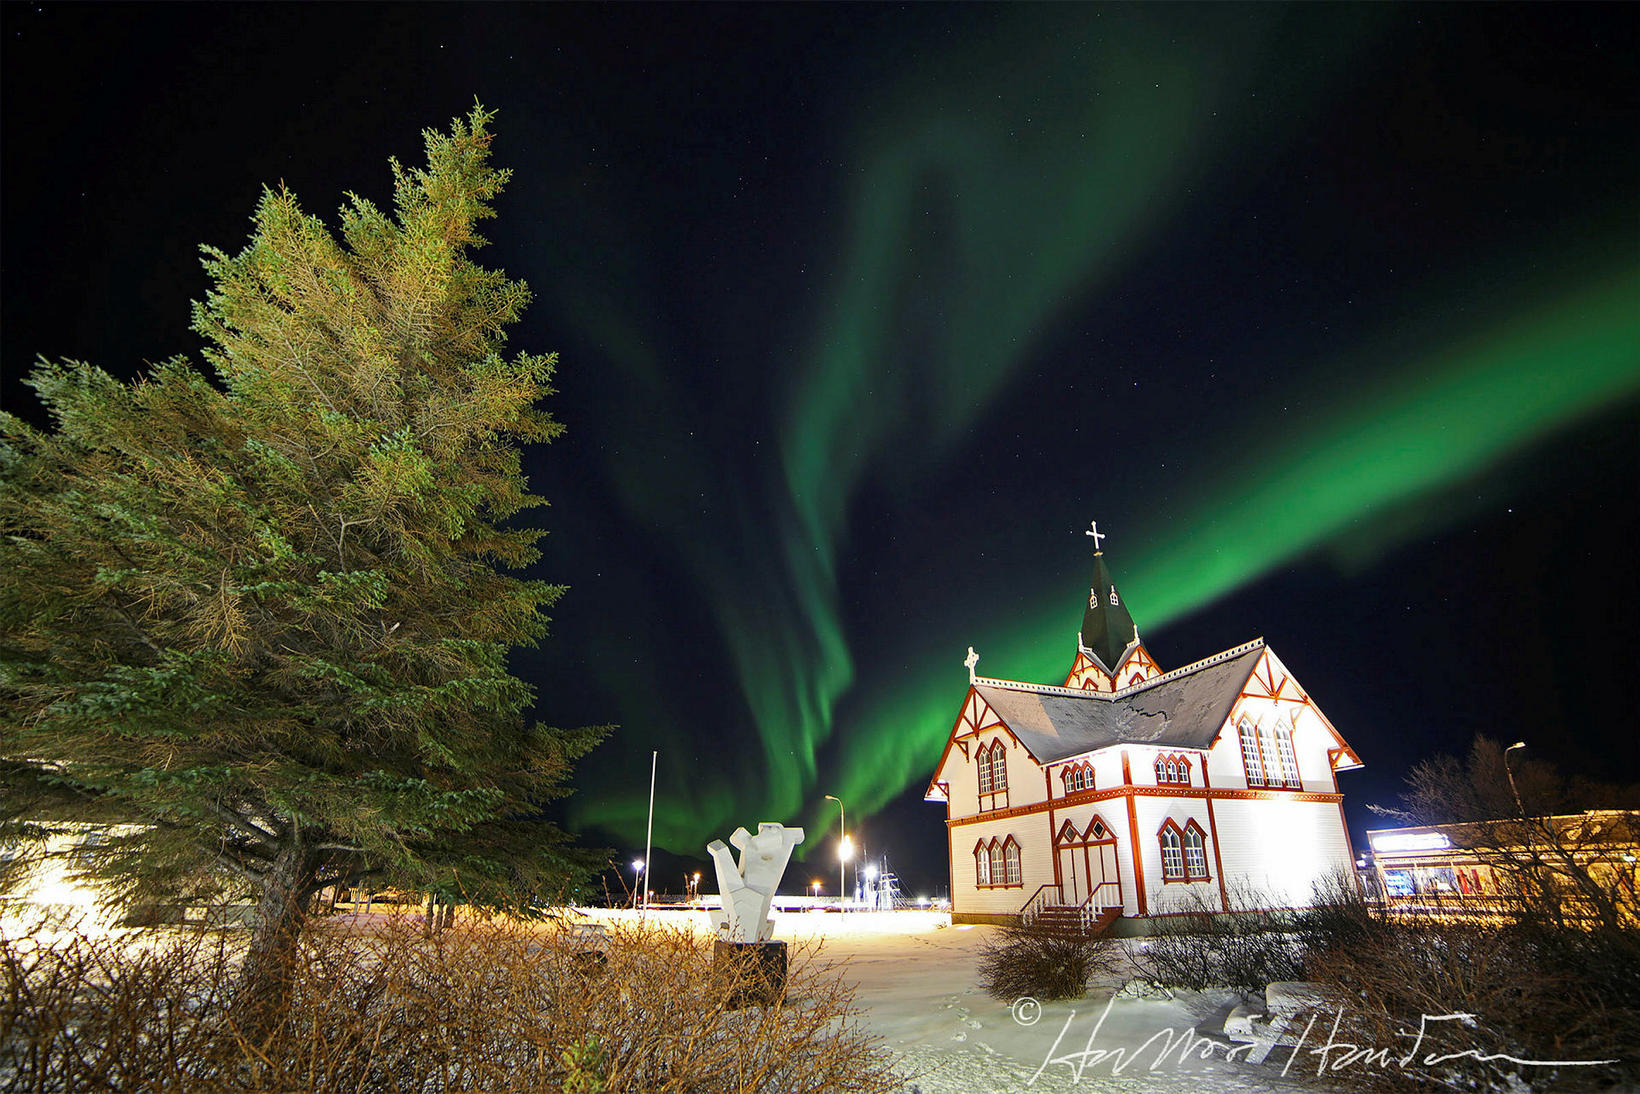 Húsavík Church, under the northern lights last night.